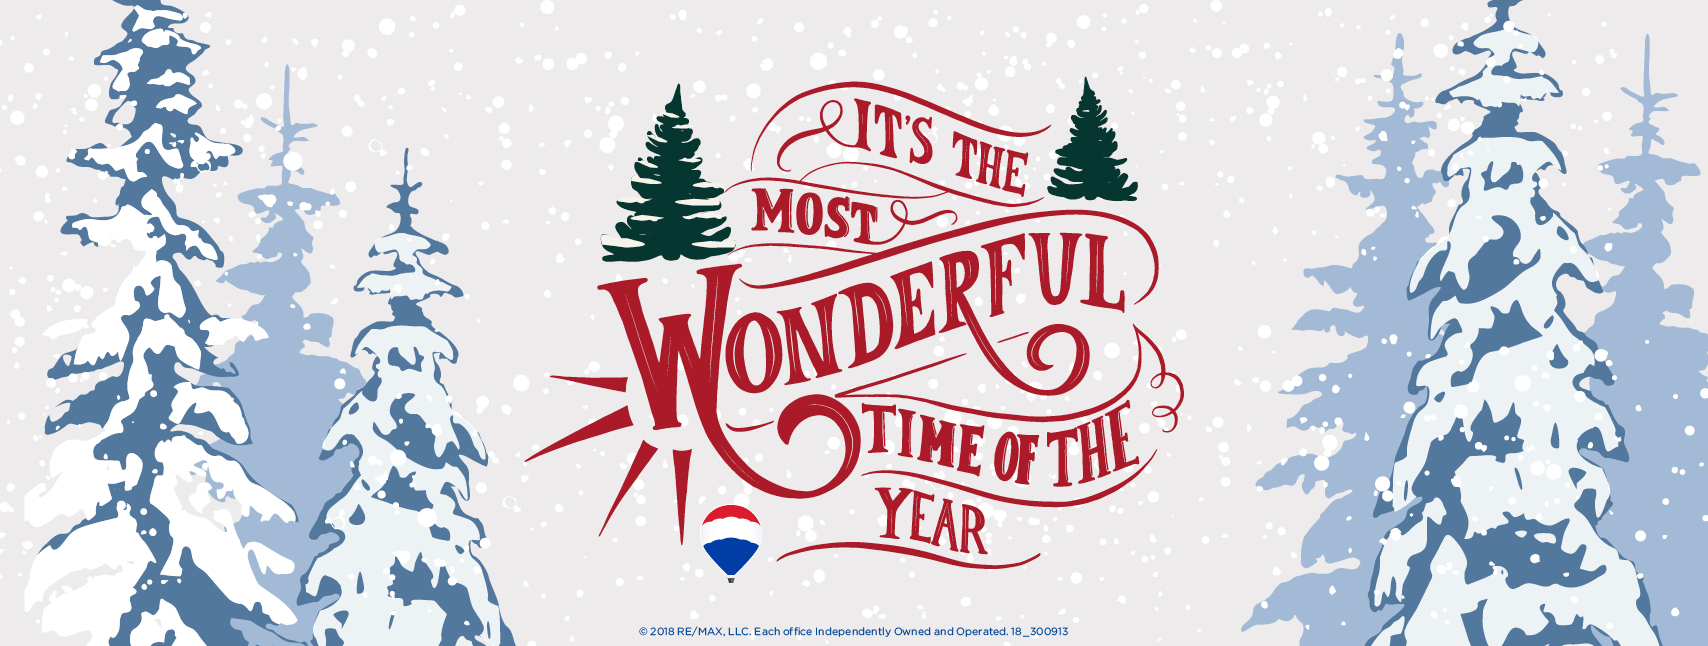 FB_WINTER18_300913_WinterHoliday-Cover-Christmas-Facebook.jpg